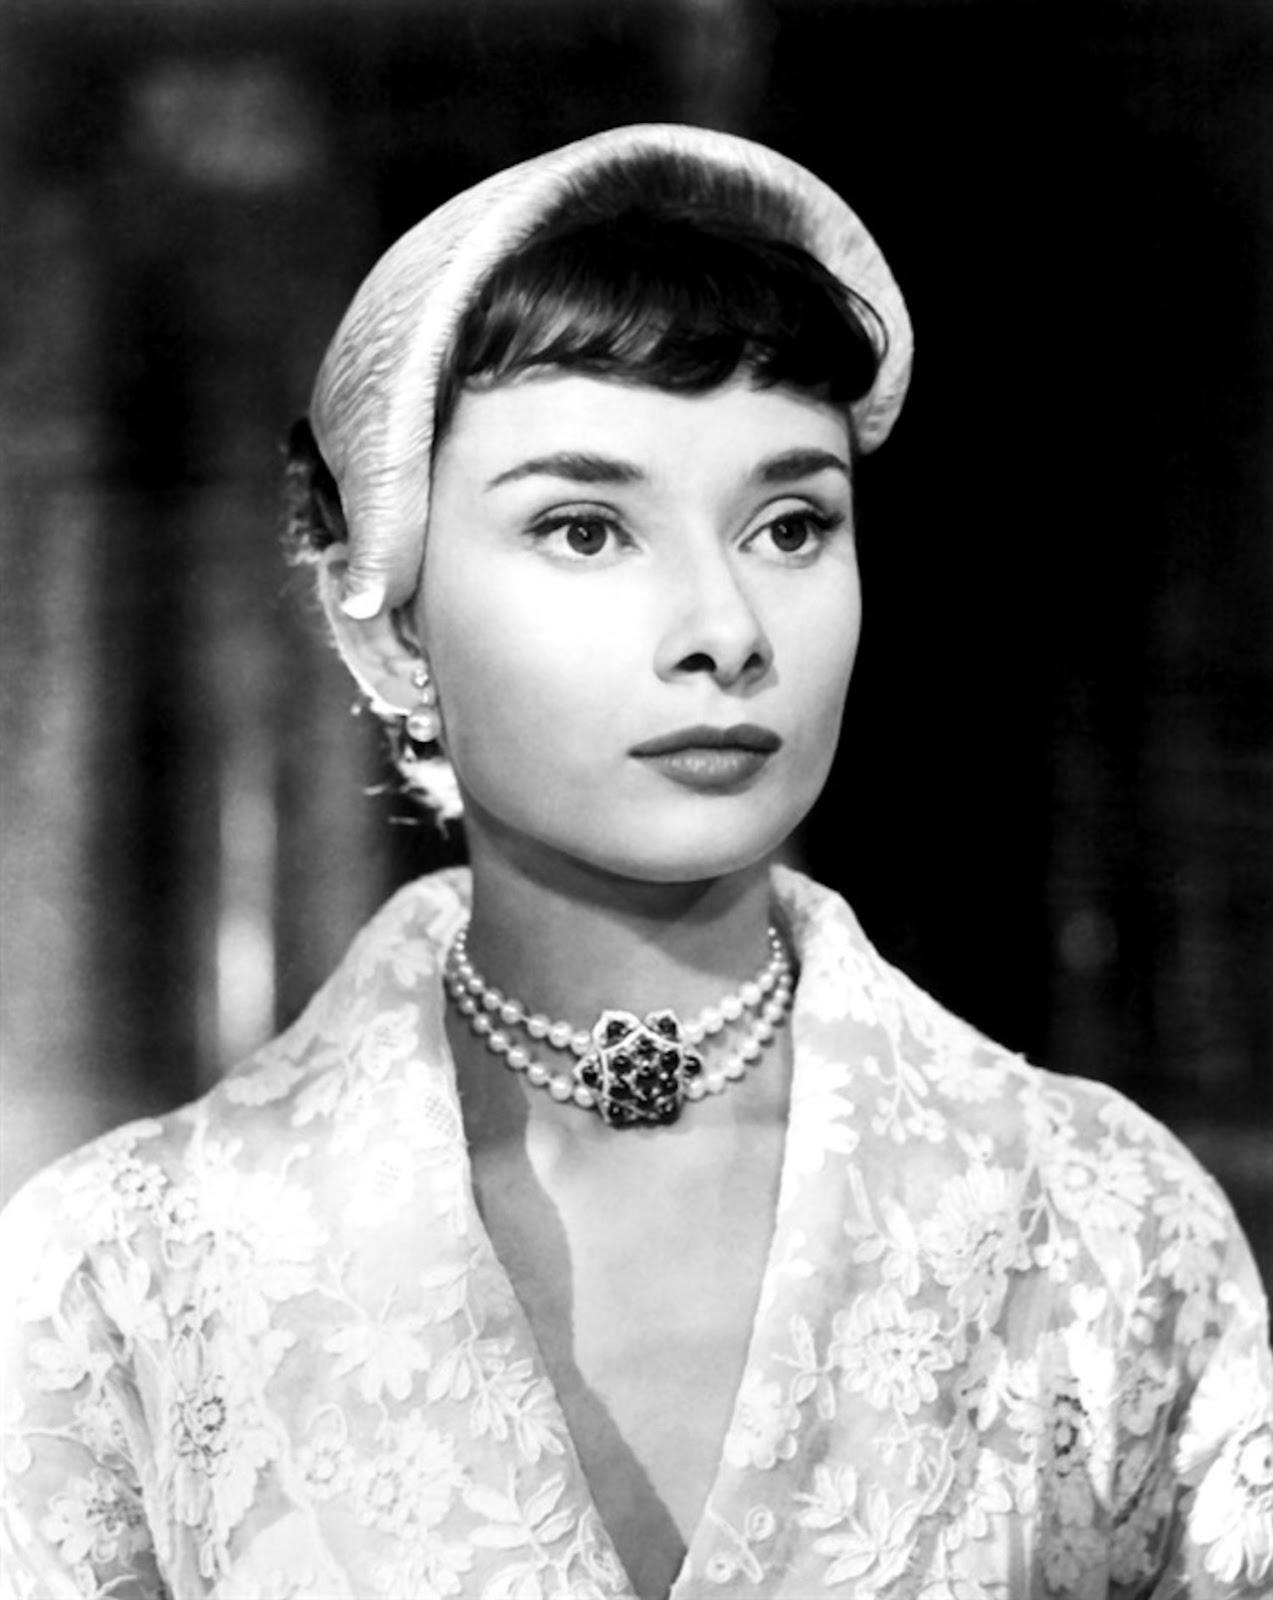 Audrey Hepburn In The Movie Roman Holiday 1953 Blueiskewl